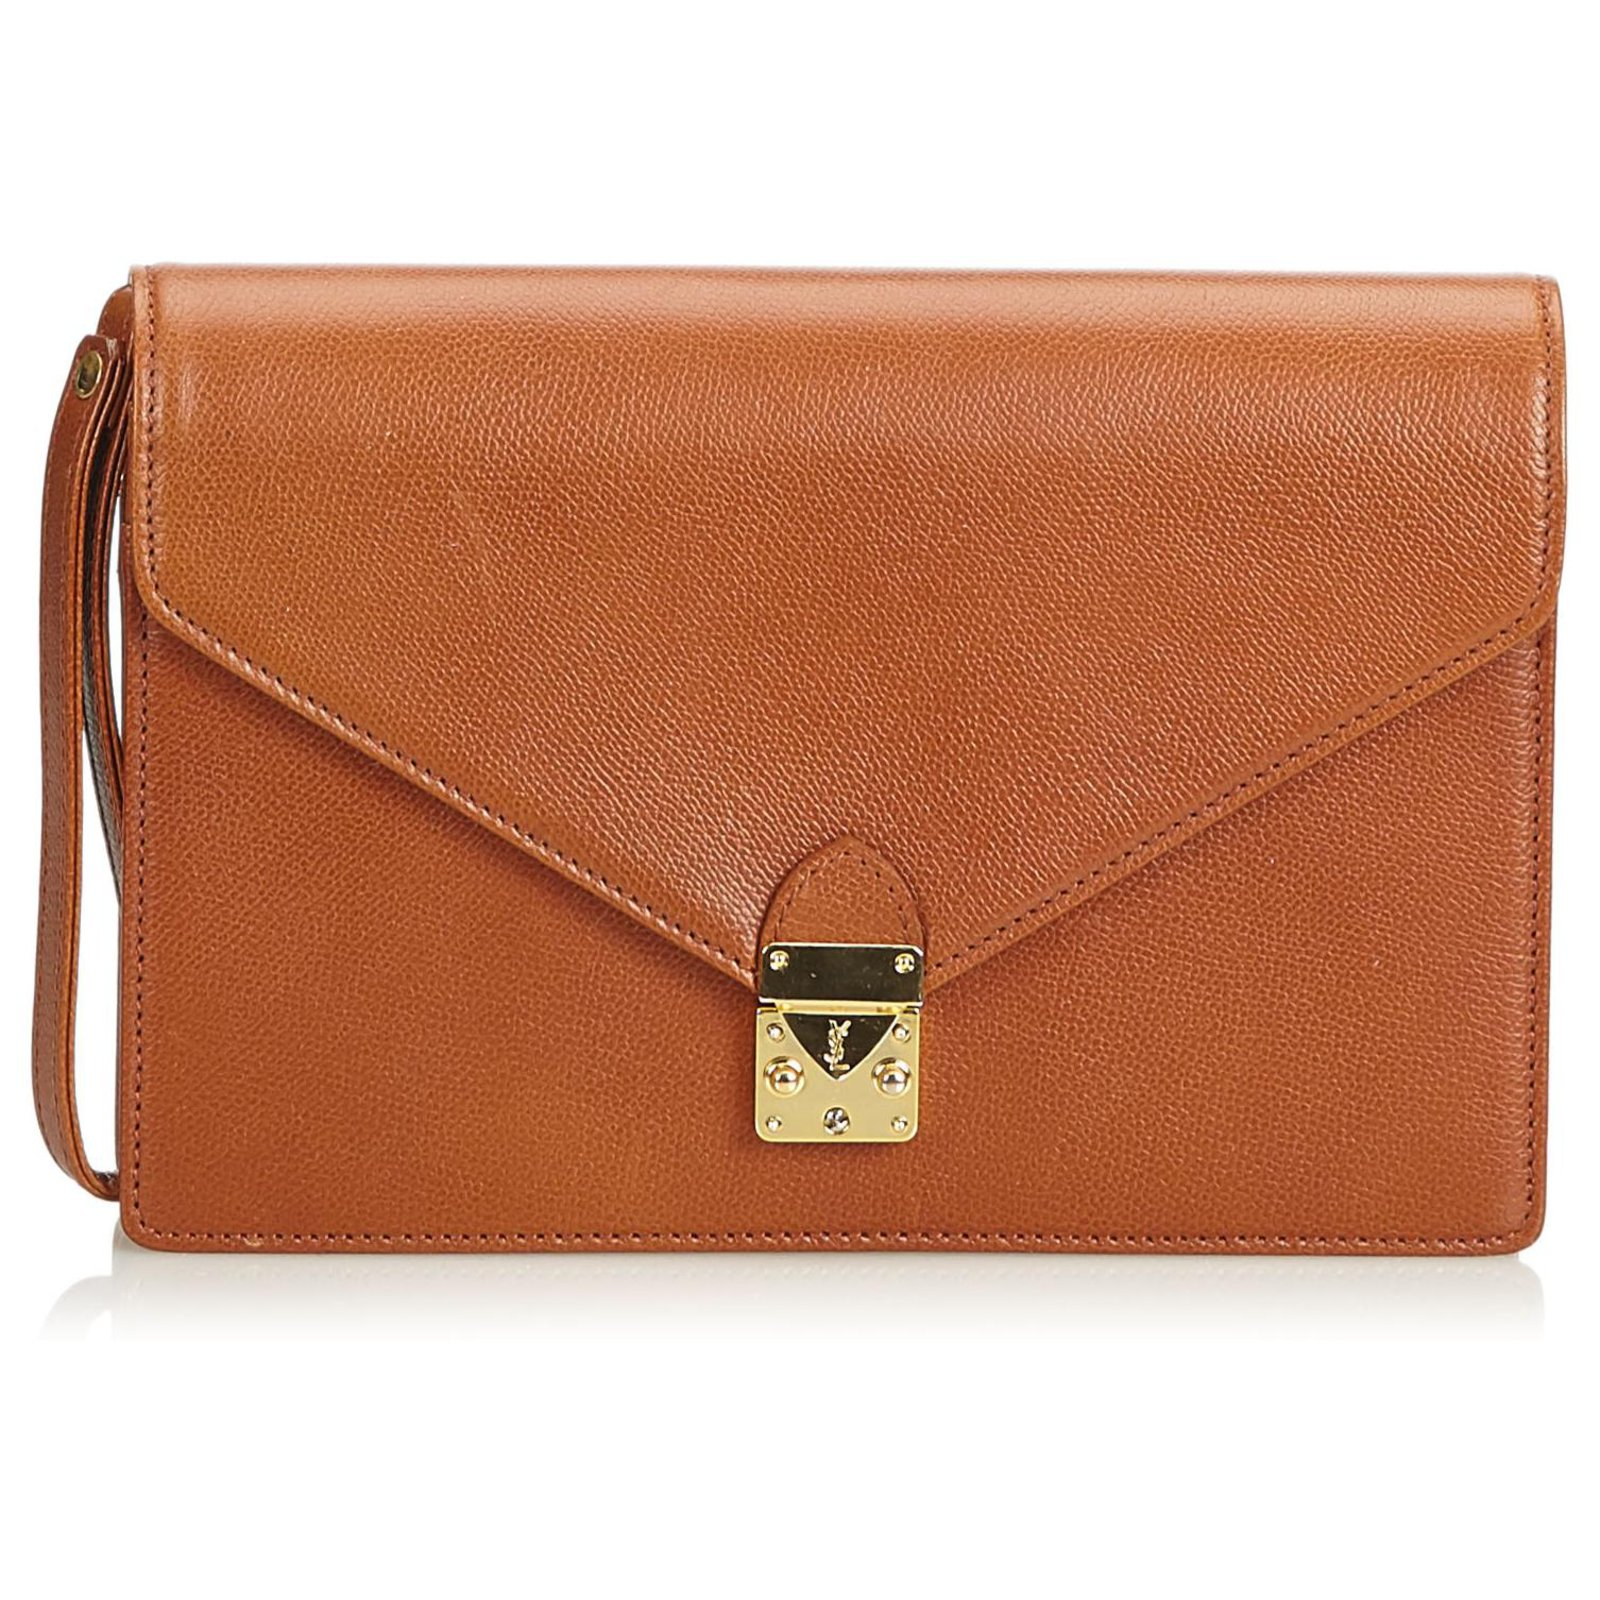 afc2a2dabfc Autre Marque YSL Brown Leather Clutch Bag Clutch bags Leather,Other Brown  ref.117462